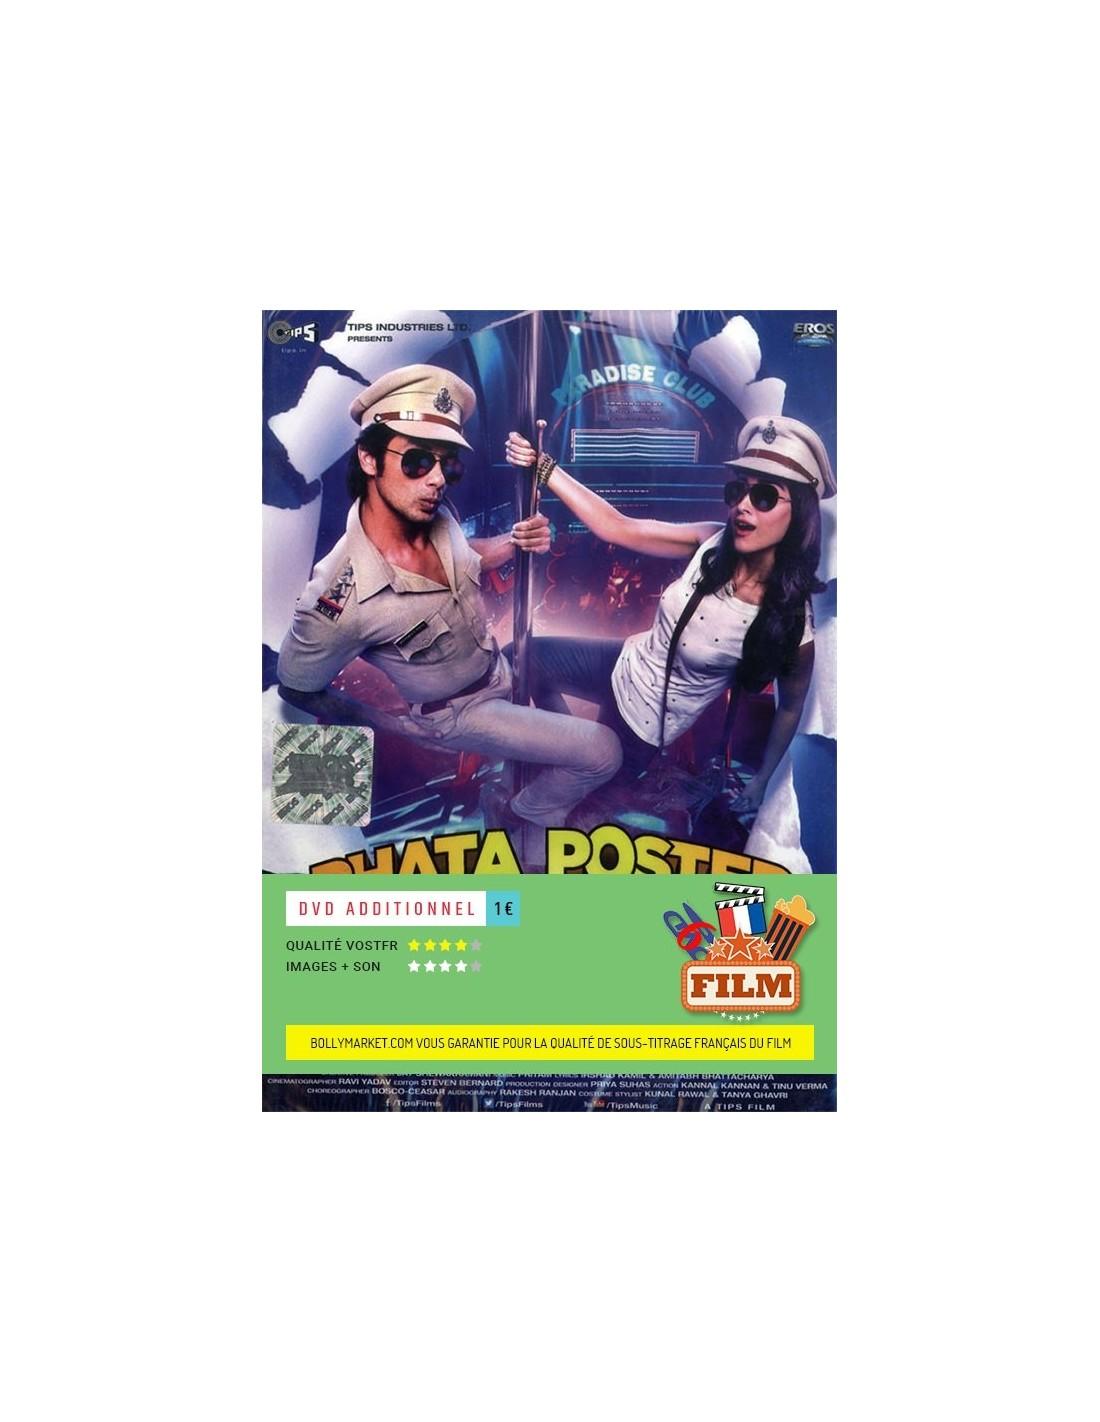 Phata poster nikla hero song dating dance